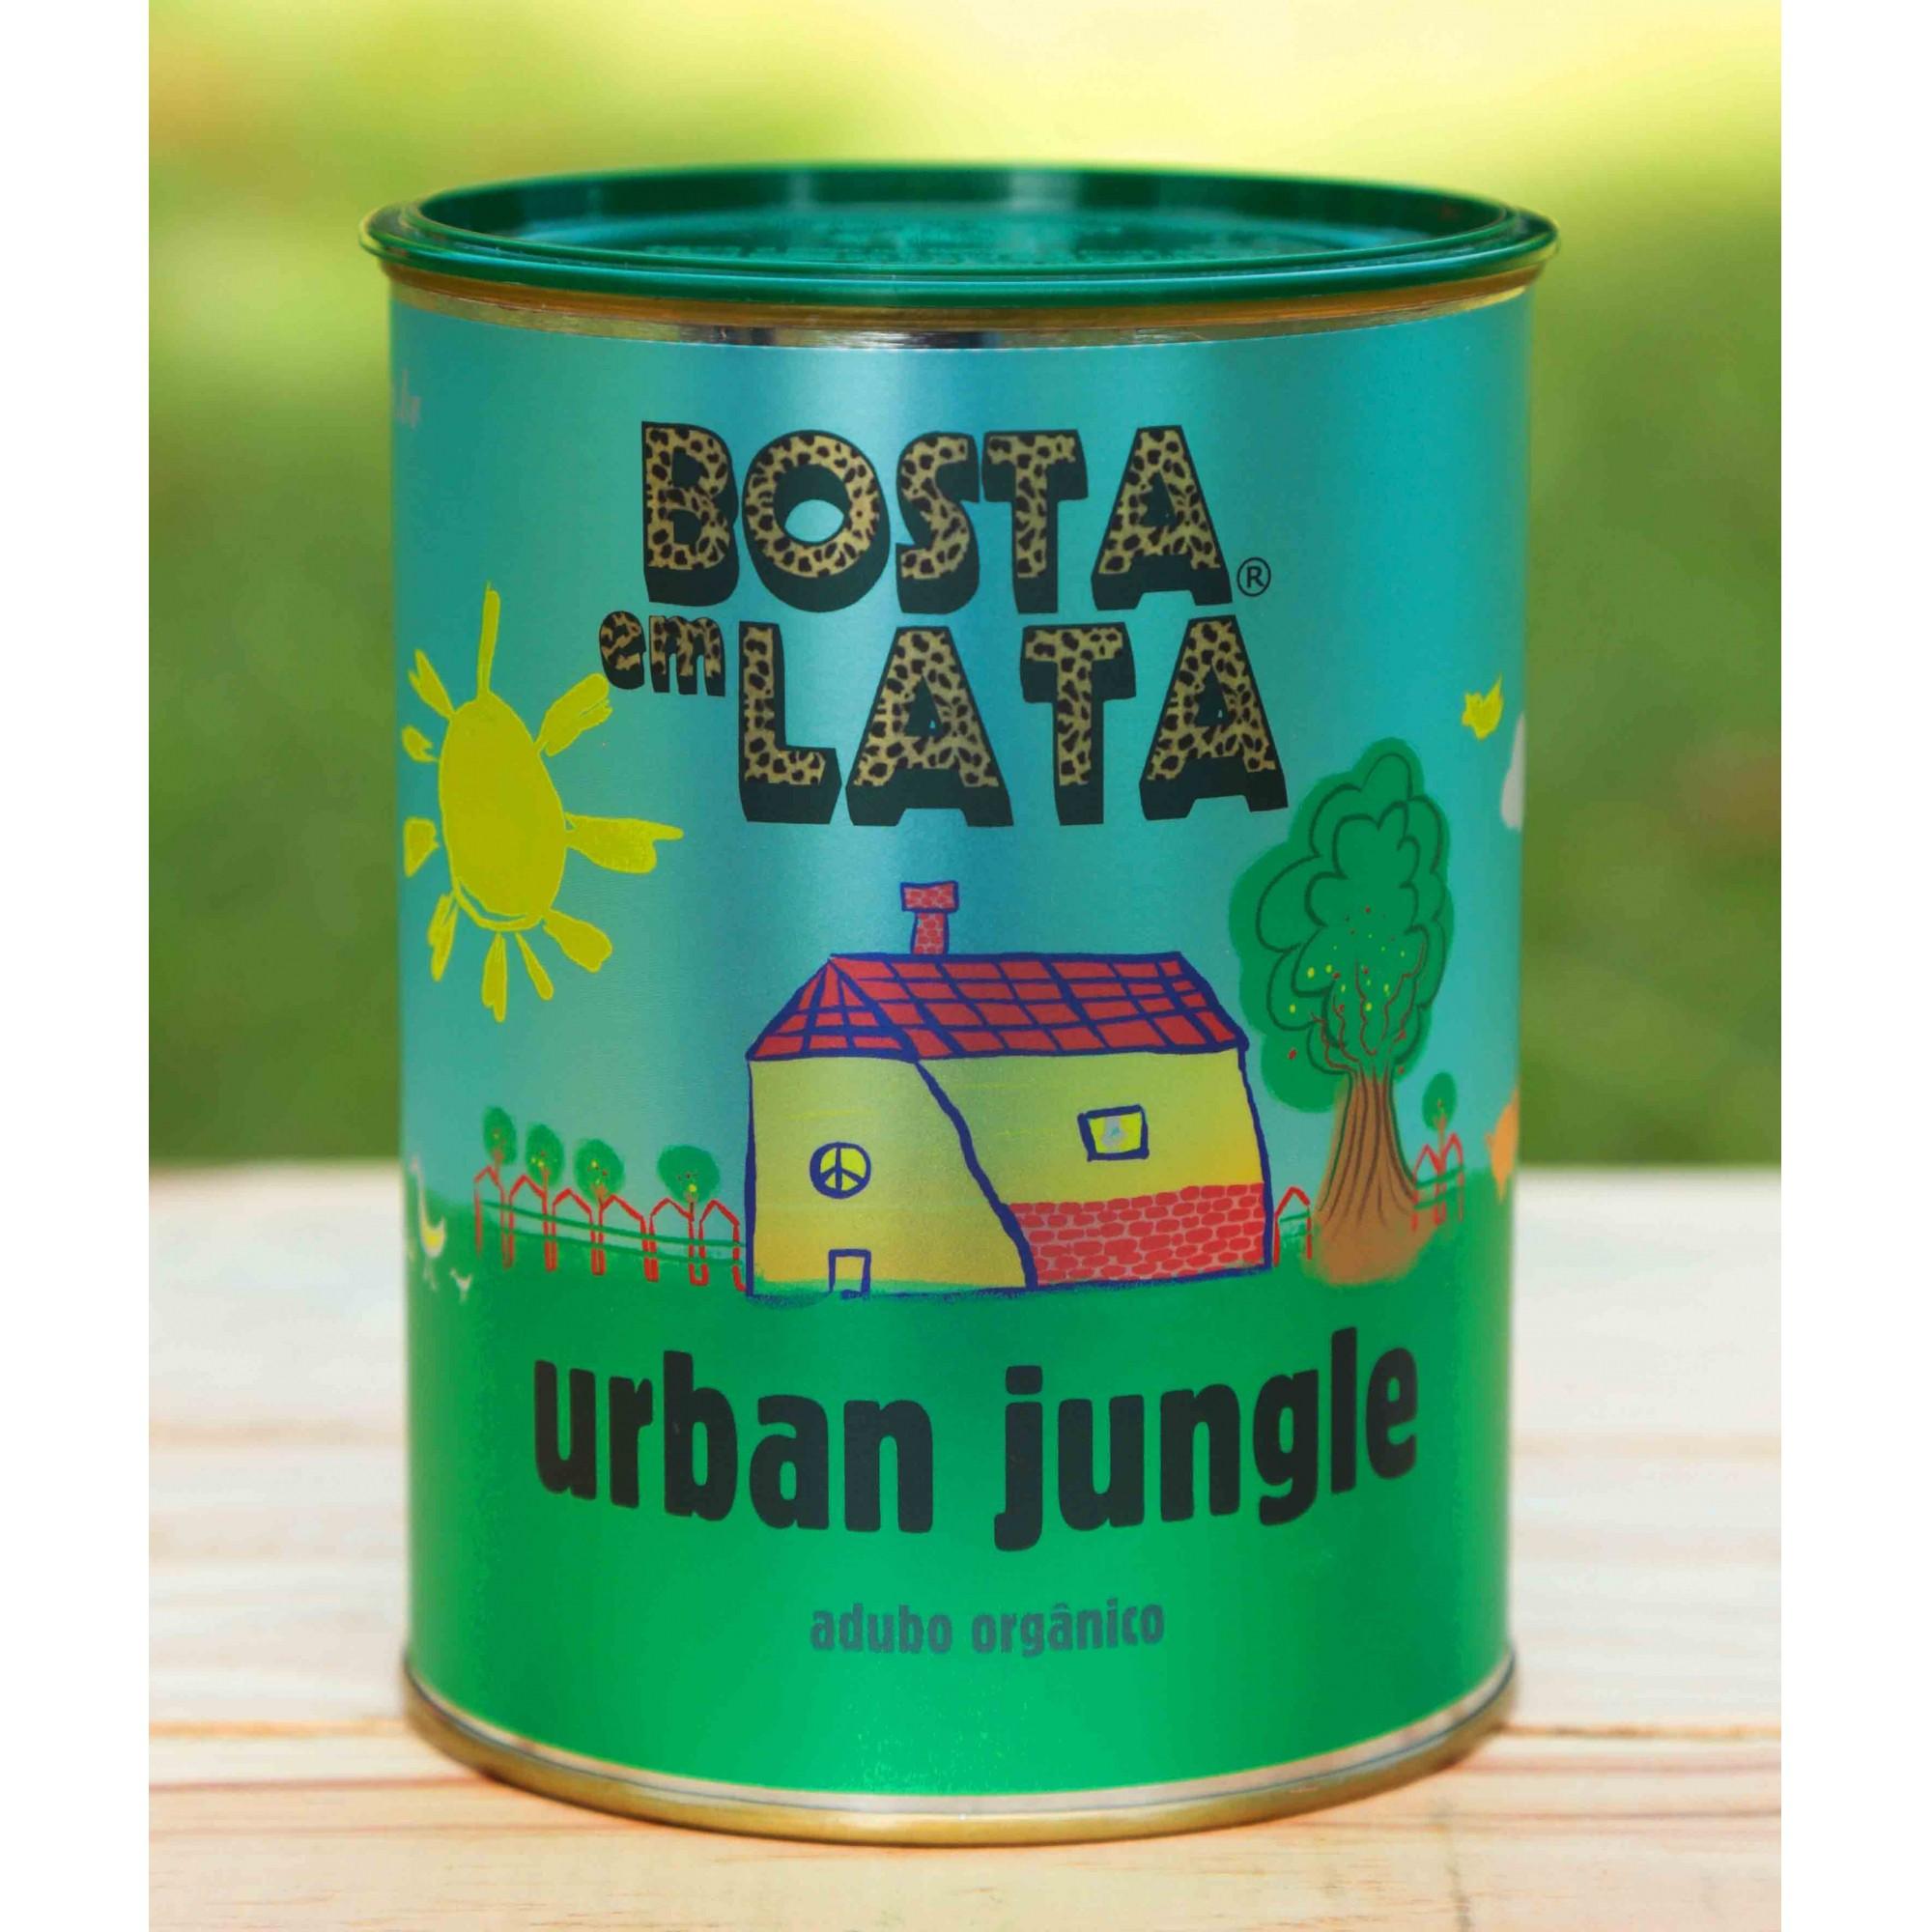 Adubo Orgânico Bosta em Lata Urban Jungle 500g